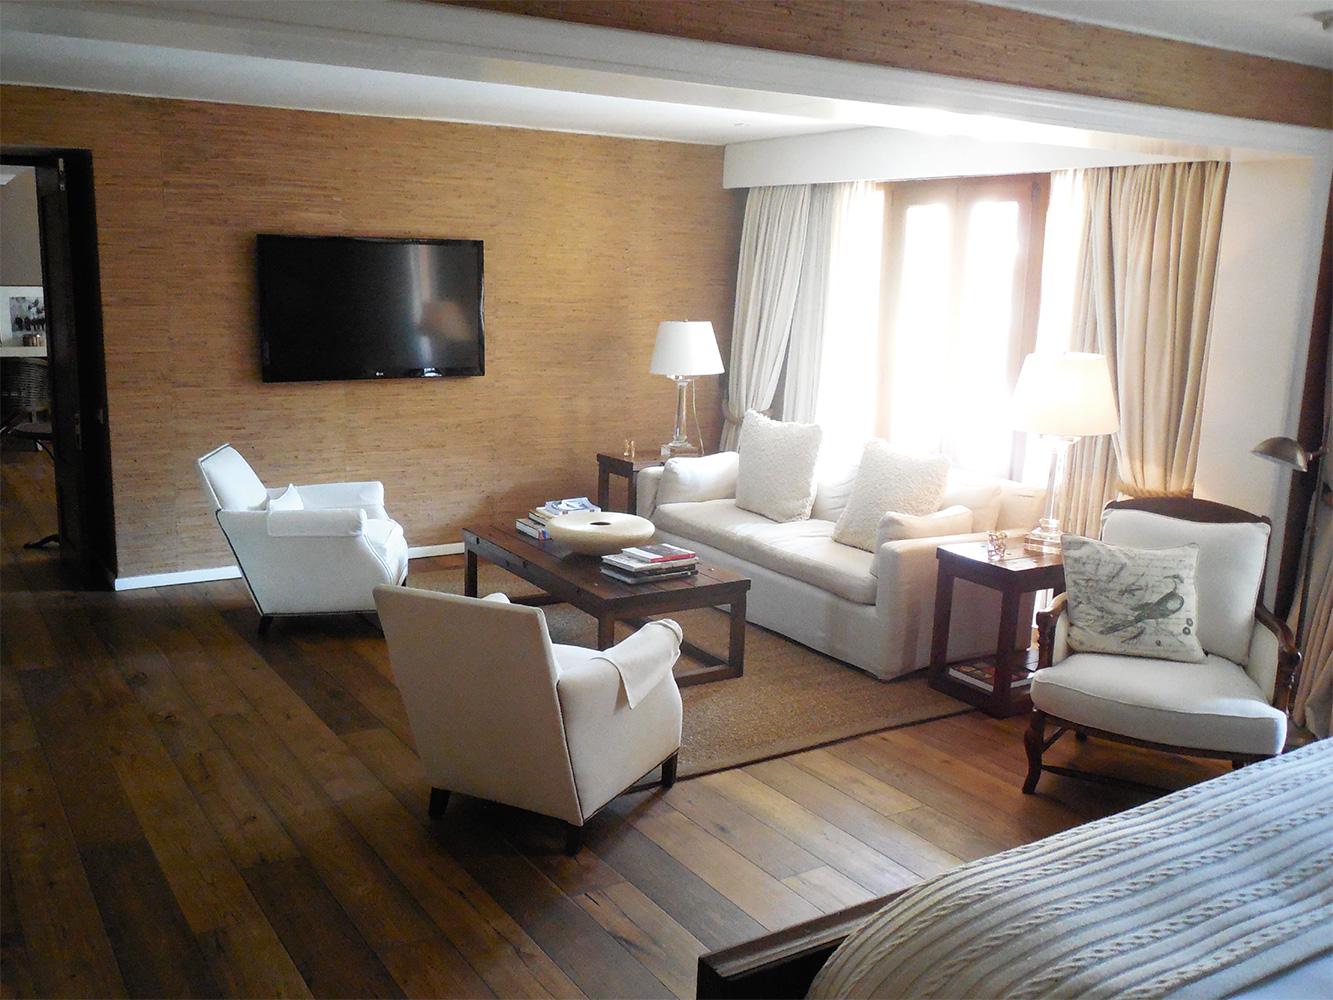 HOTEL SANTA CLARA 01